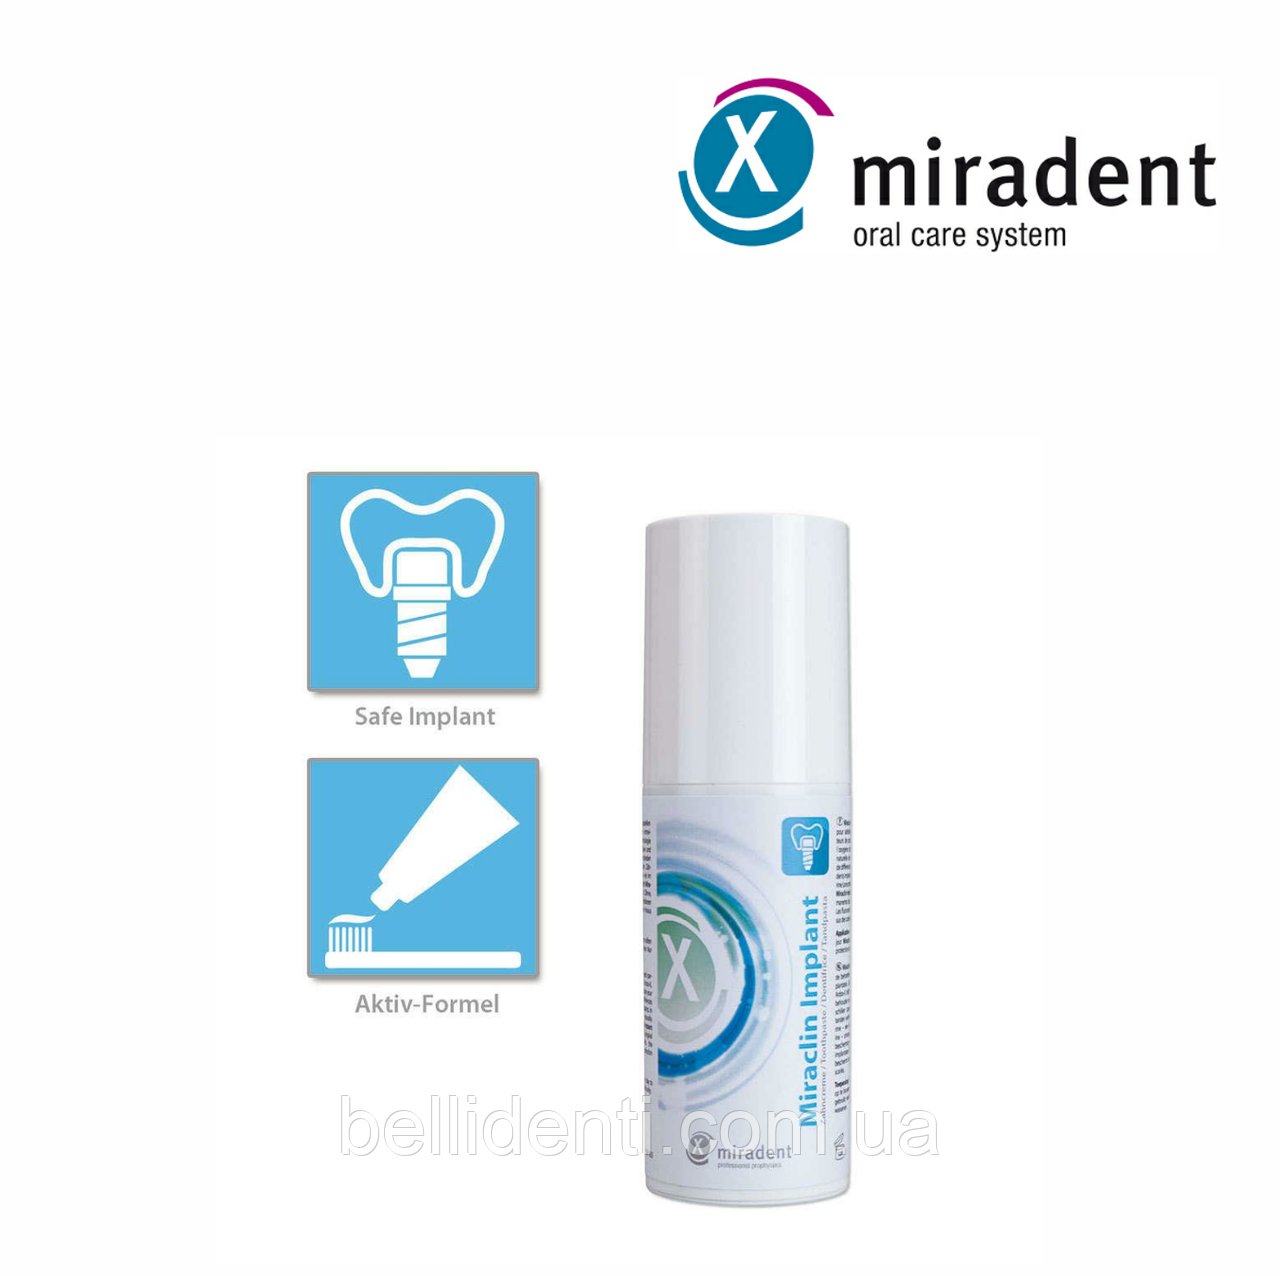 Зубная паста miradent Miraclin Implant, 100 мл